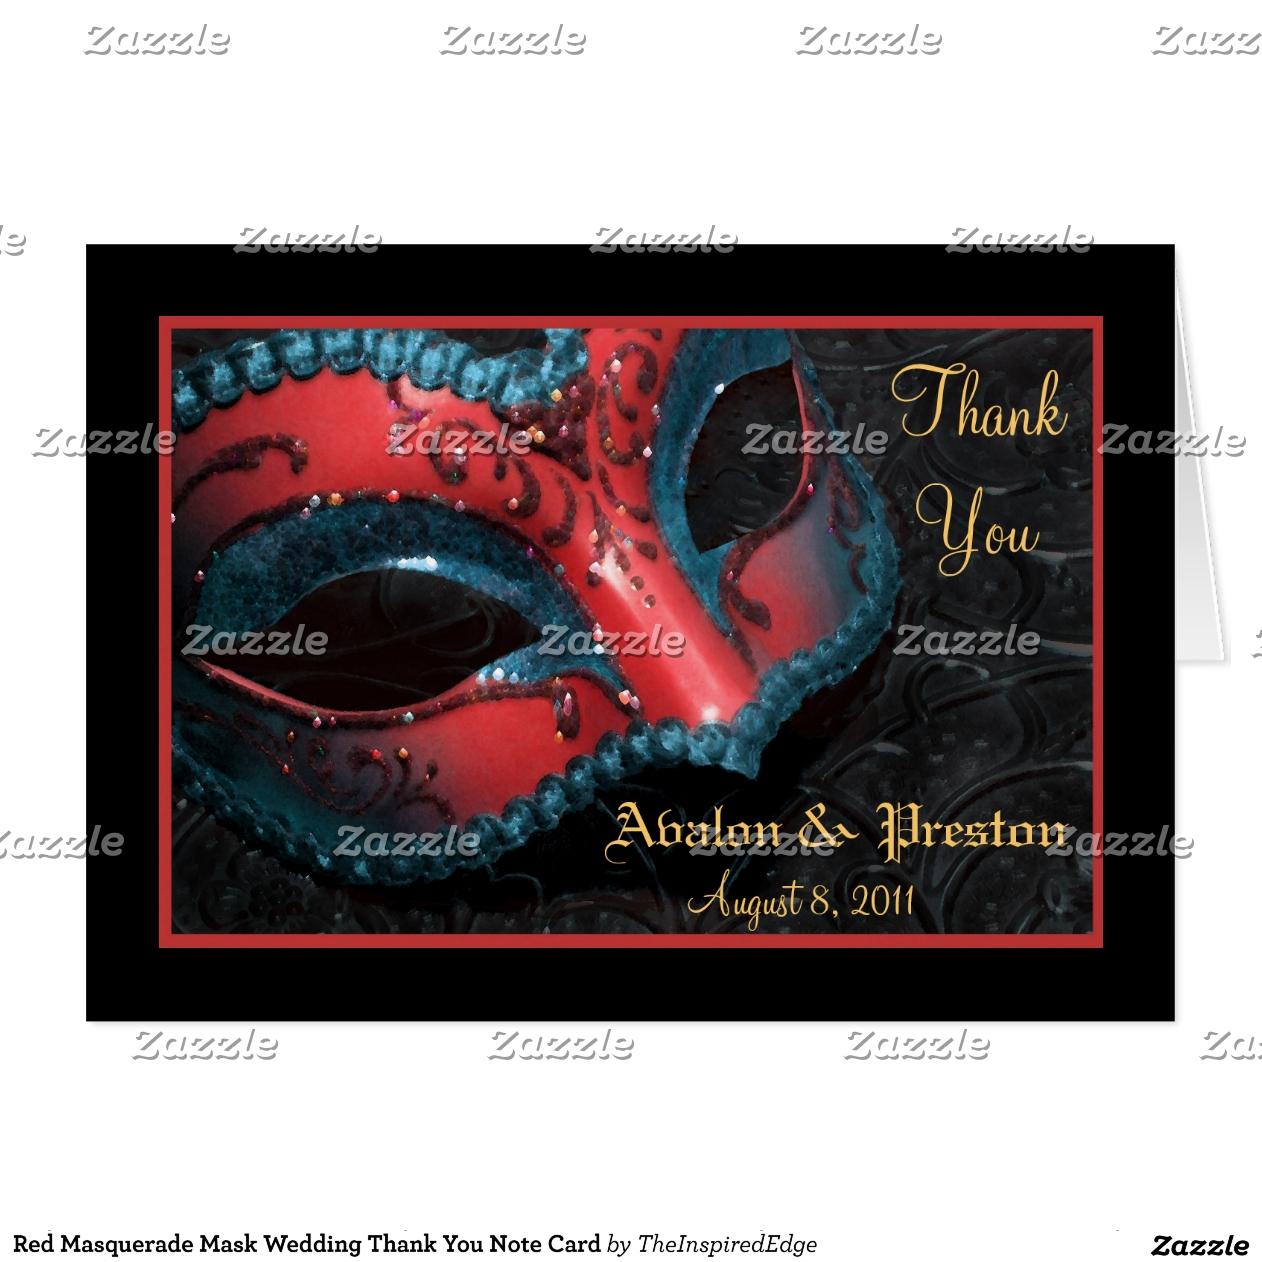 Maskerade-Hochzeits-Ideen